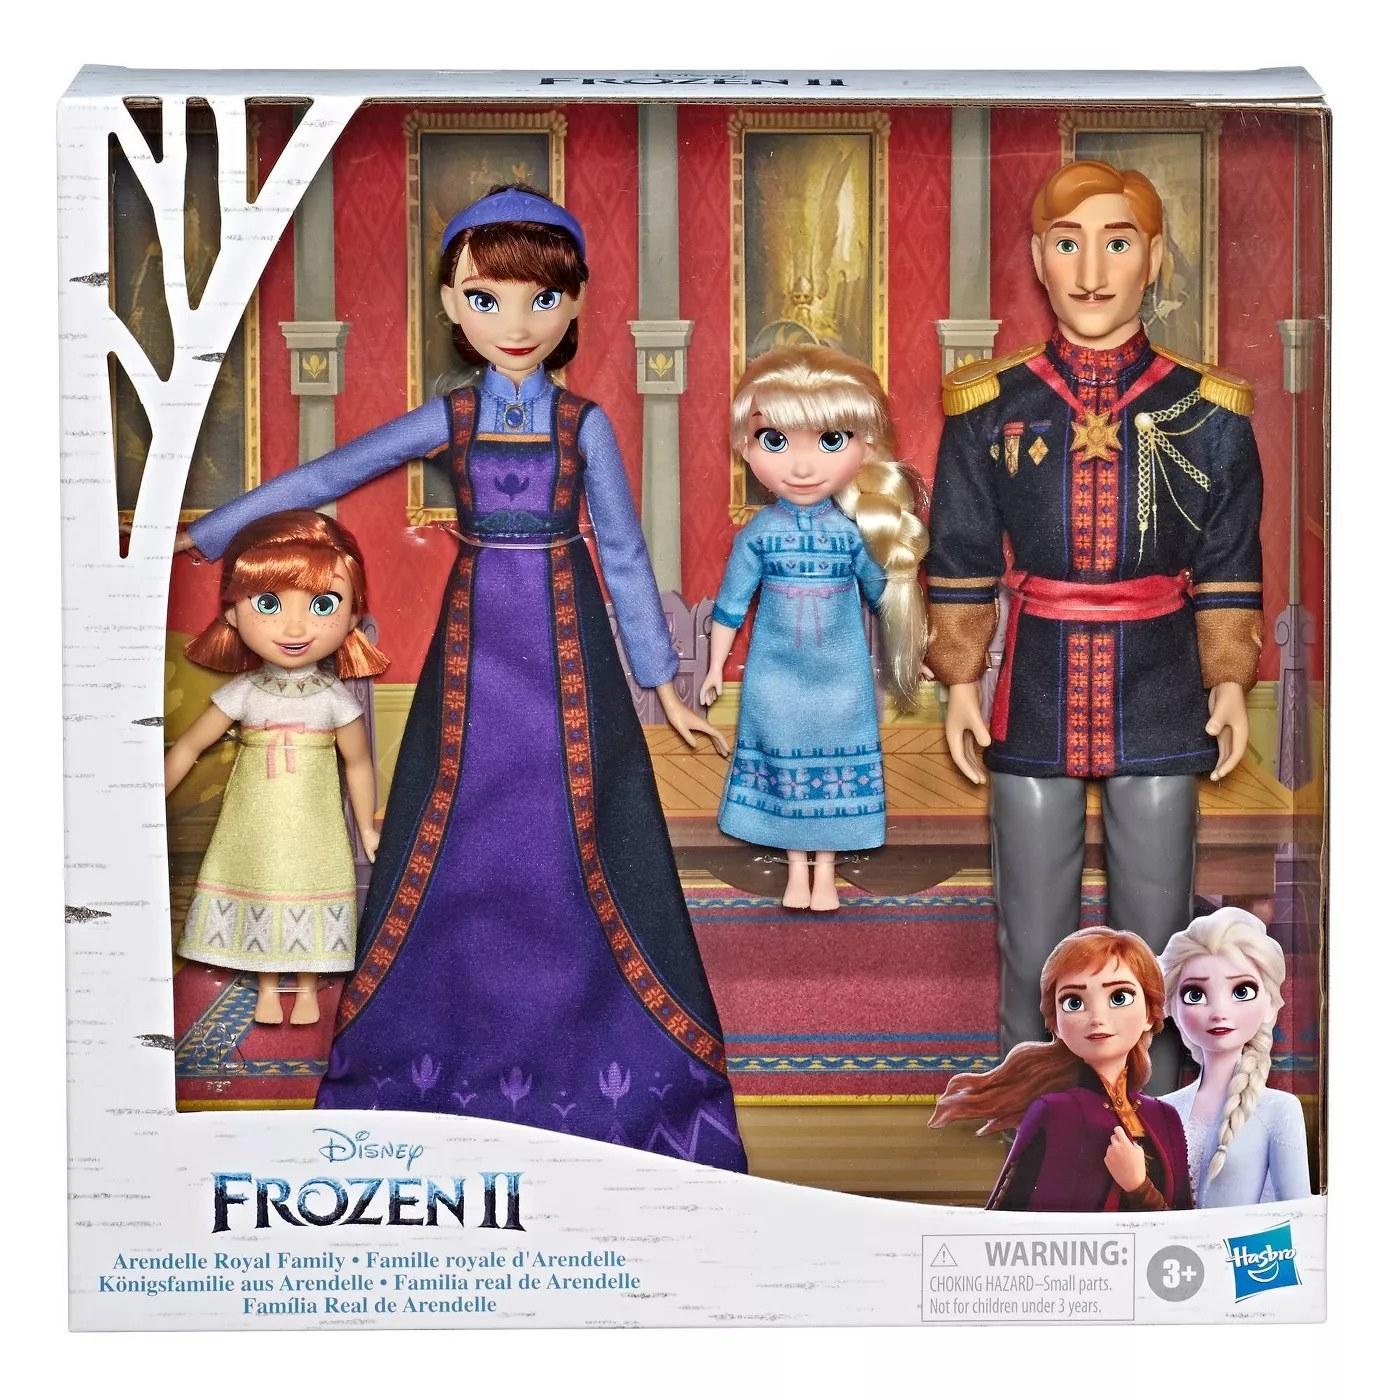 The Frozen II Arendelle royal family